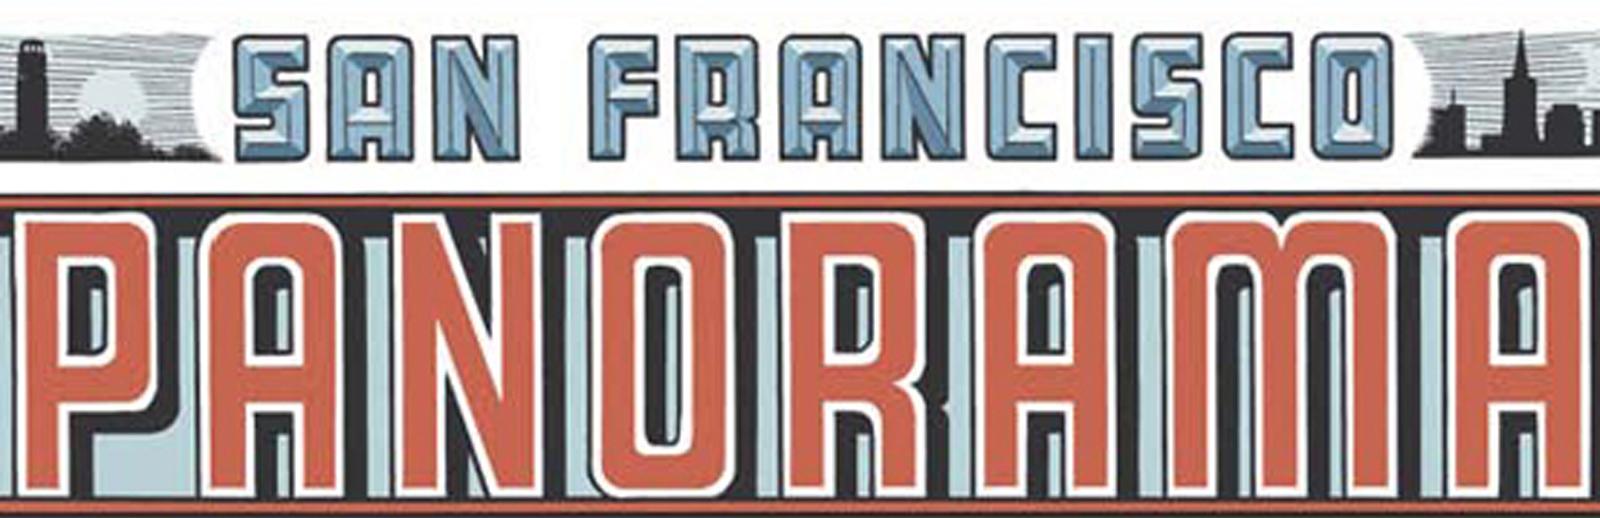 SF Panorama On Sale